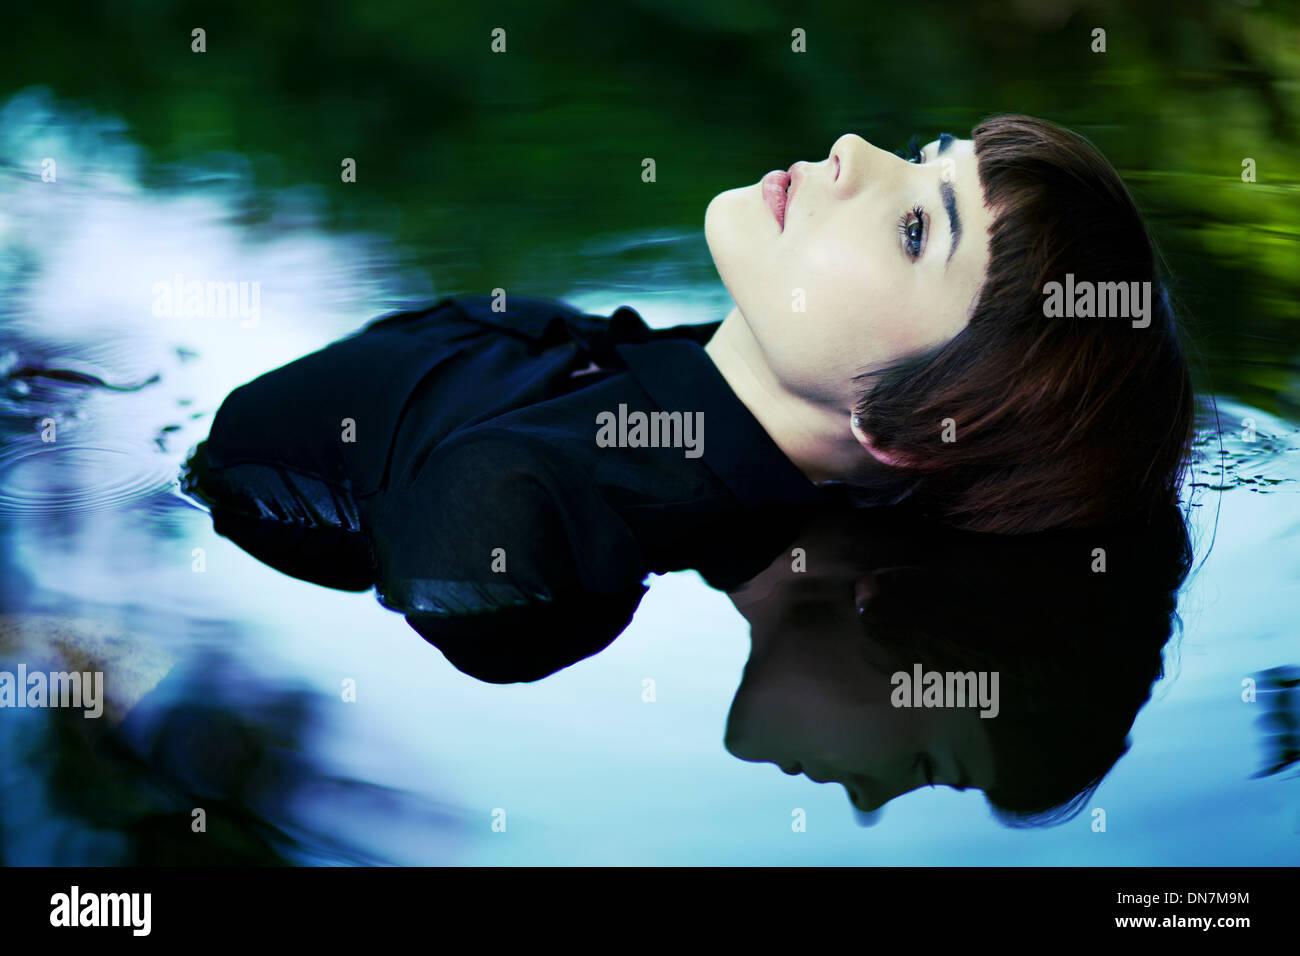 Mujer joven sentada en el agua, vertical Foto de stock